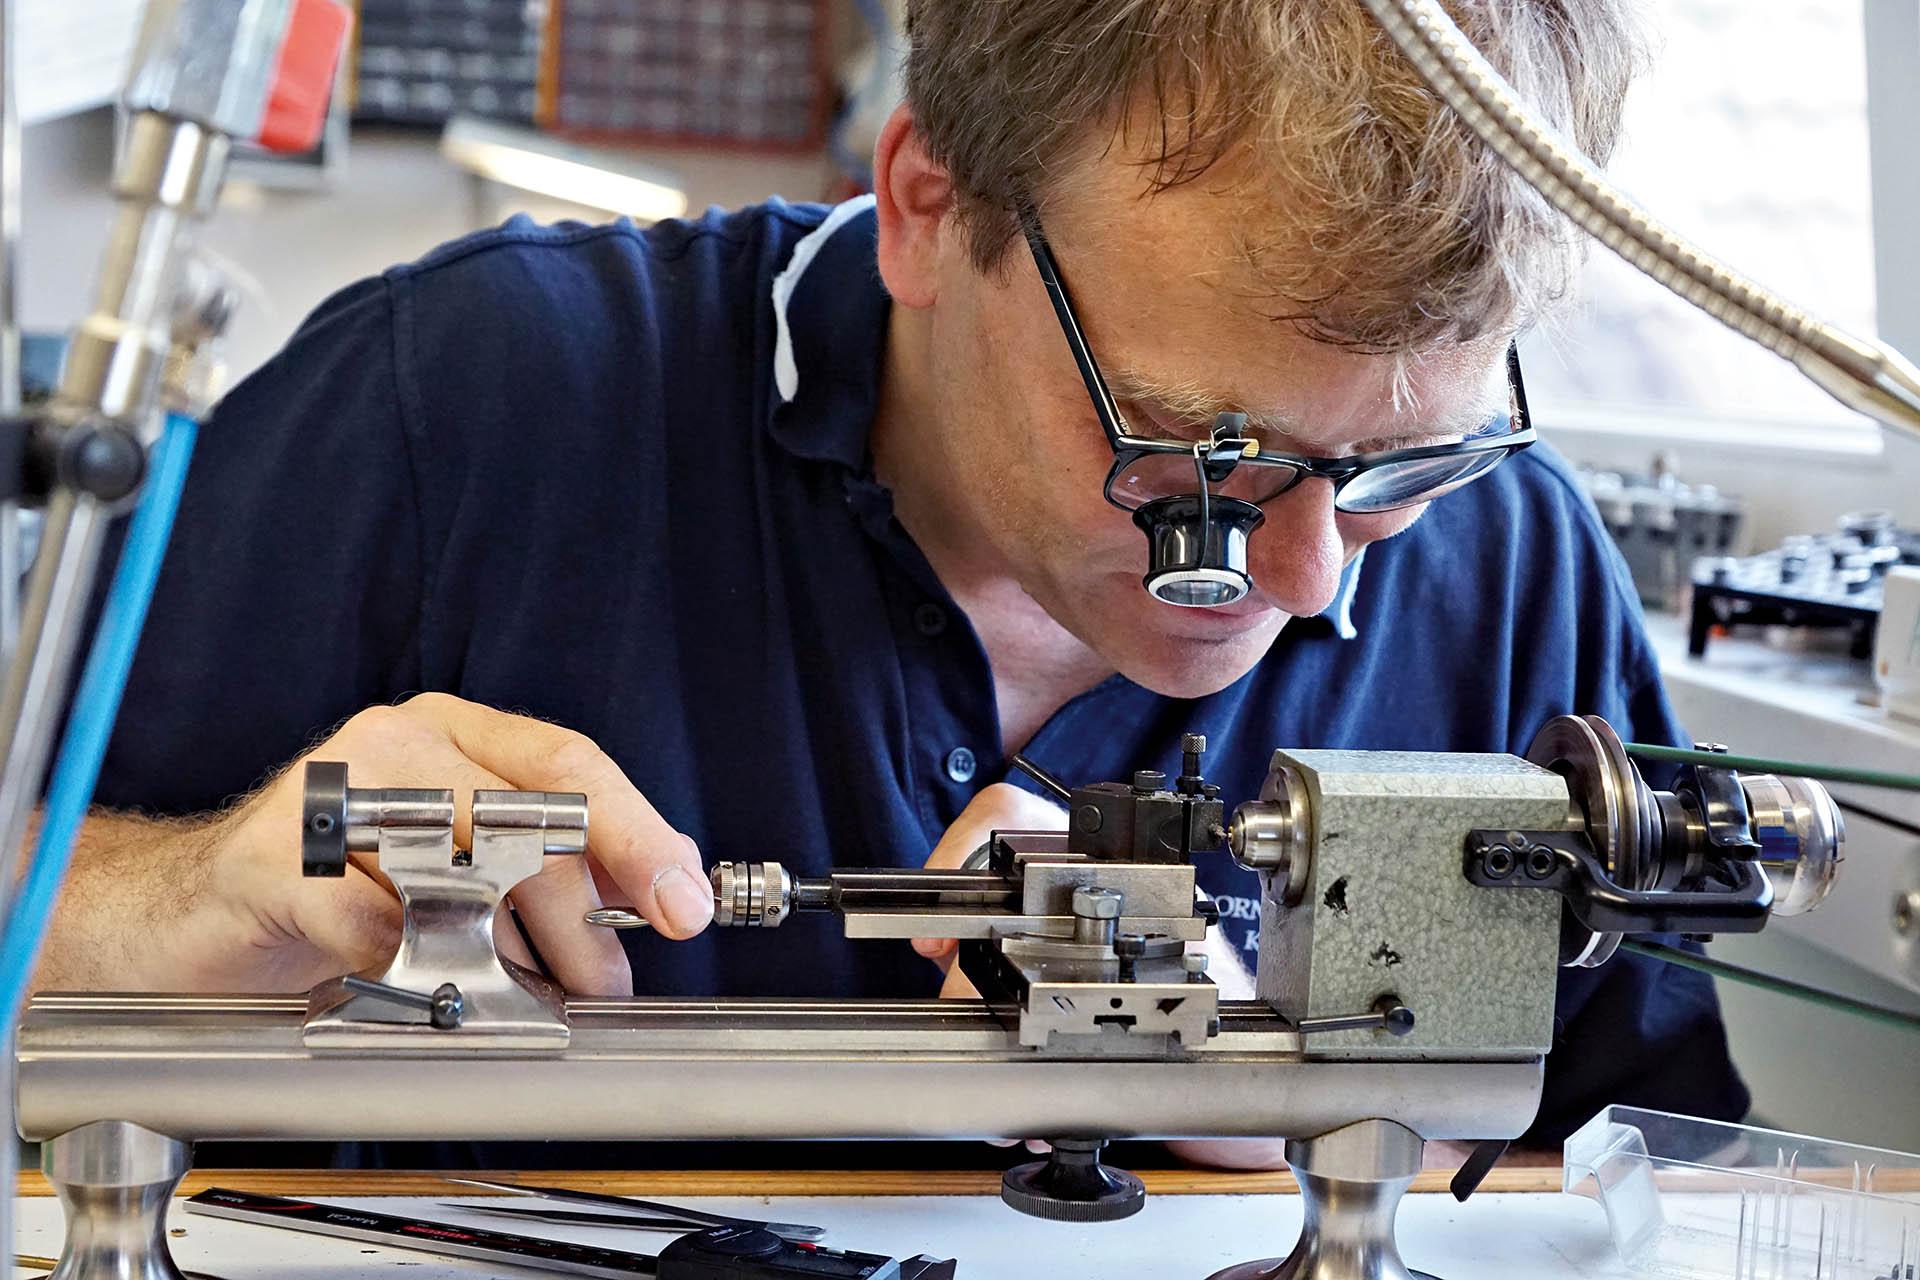 Dirk Dornblüth, D. Dornblüth & Sohn, Kalbe/Milde, Manufaktur, Made in Germany, Manufakturkaliber, deutsche Uhren,